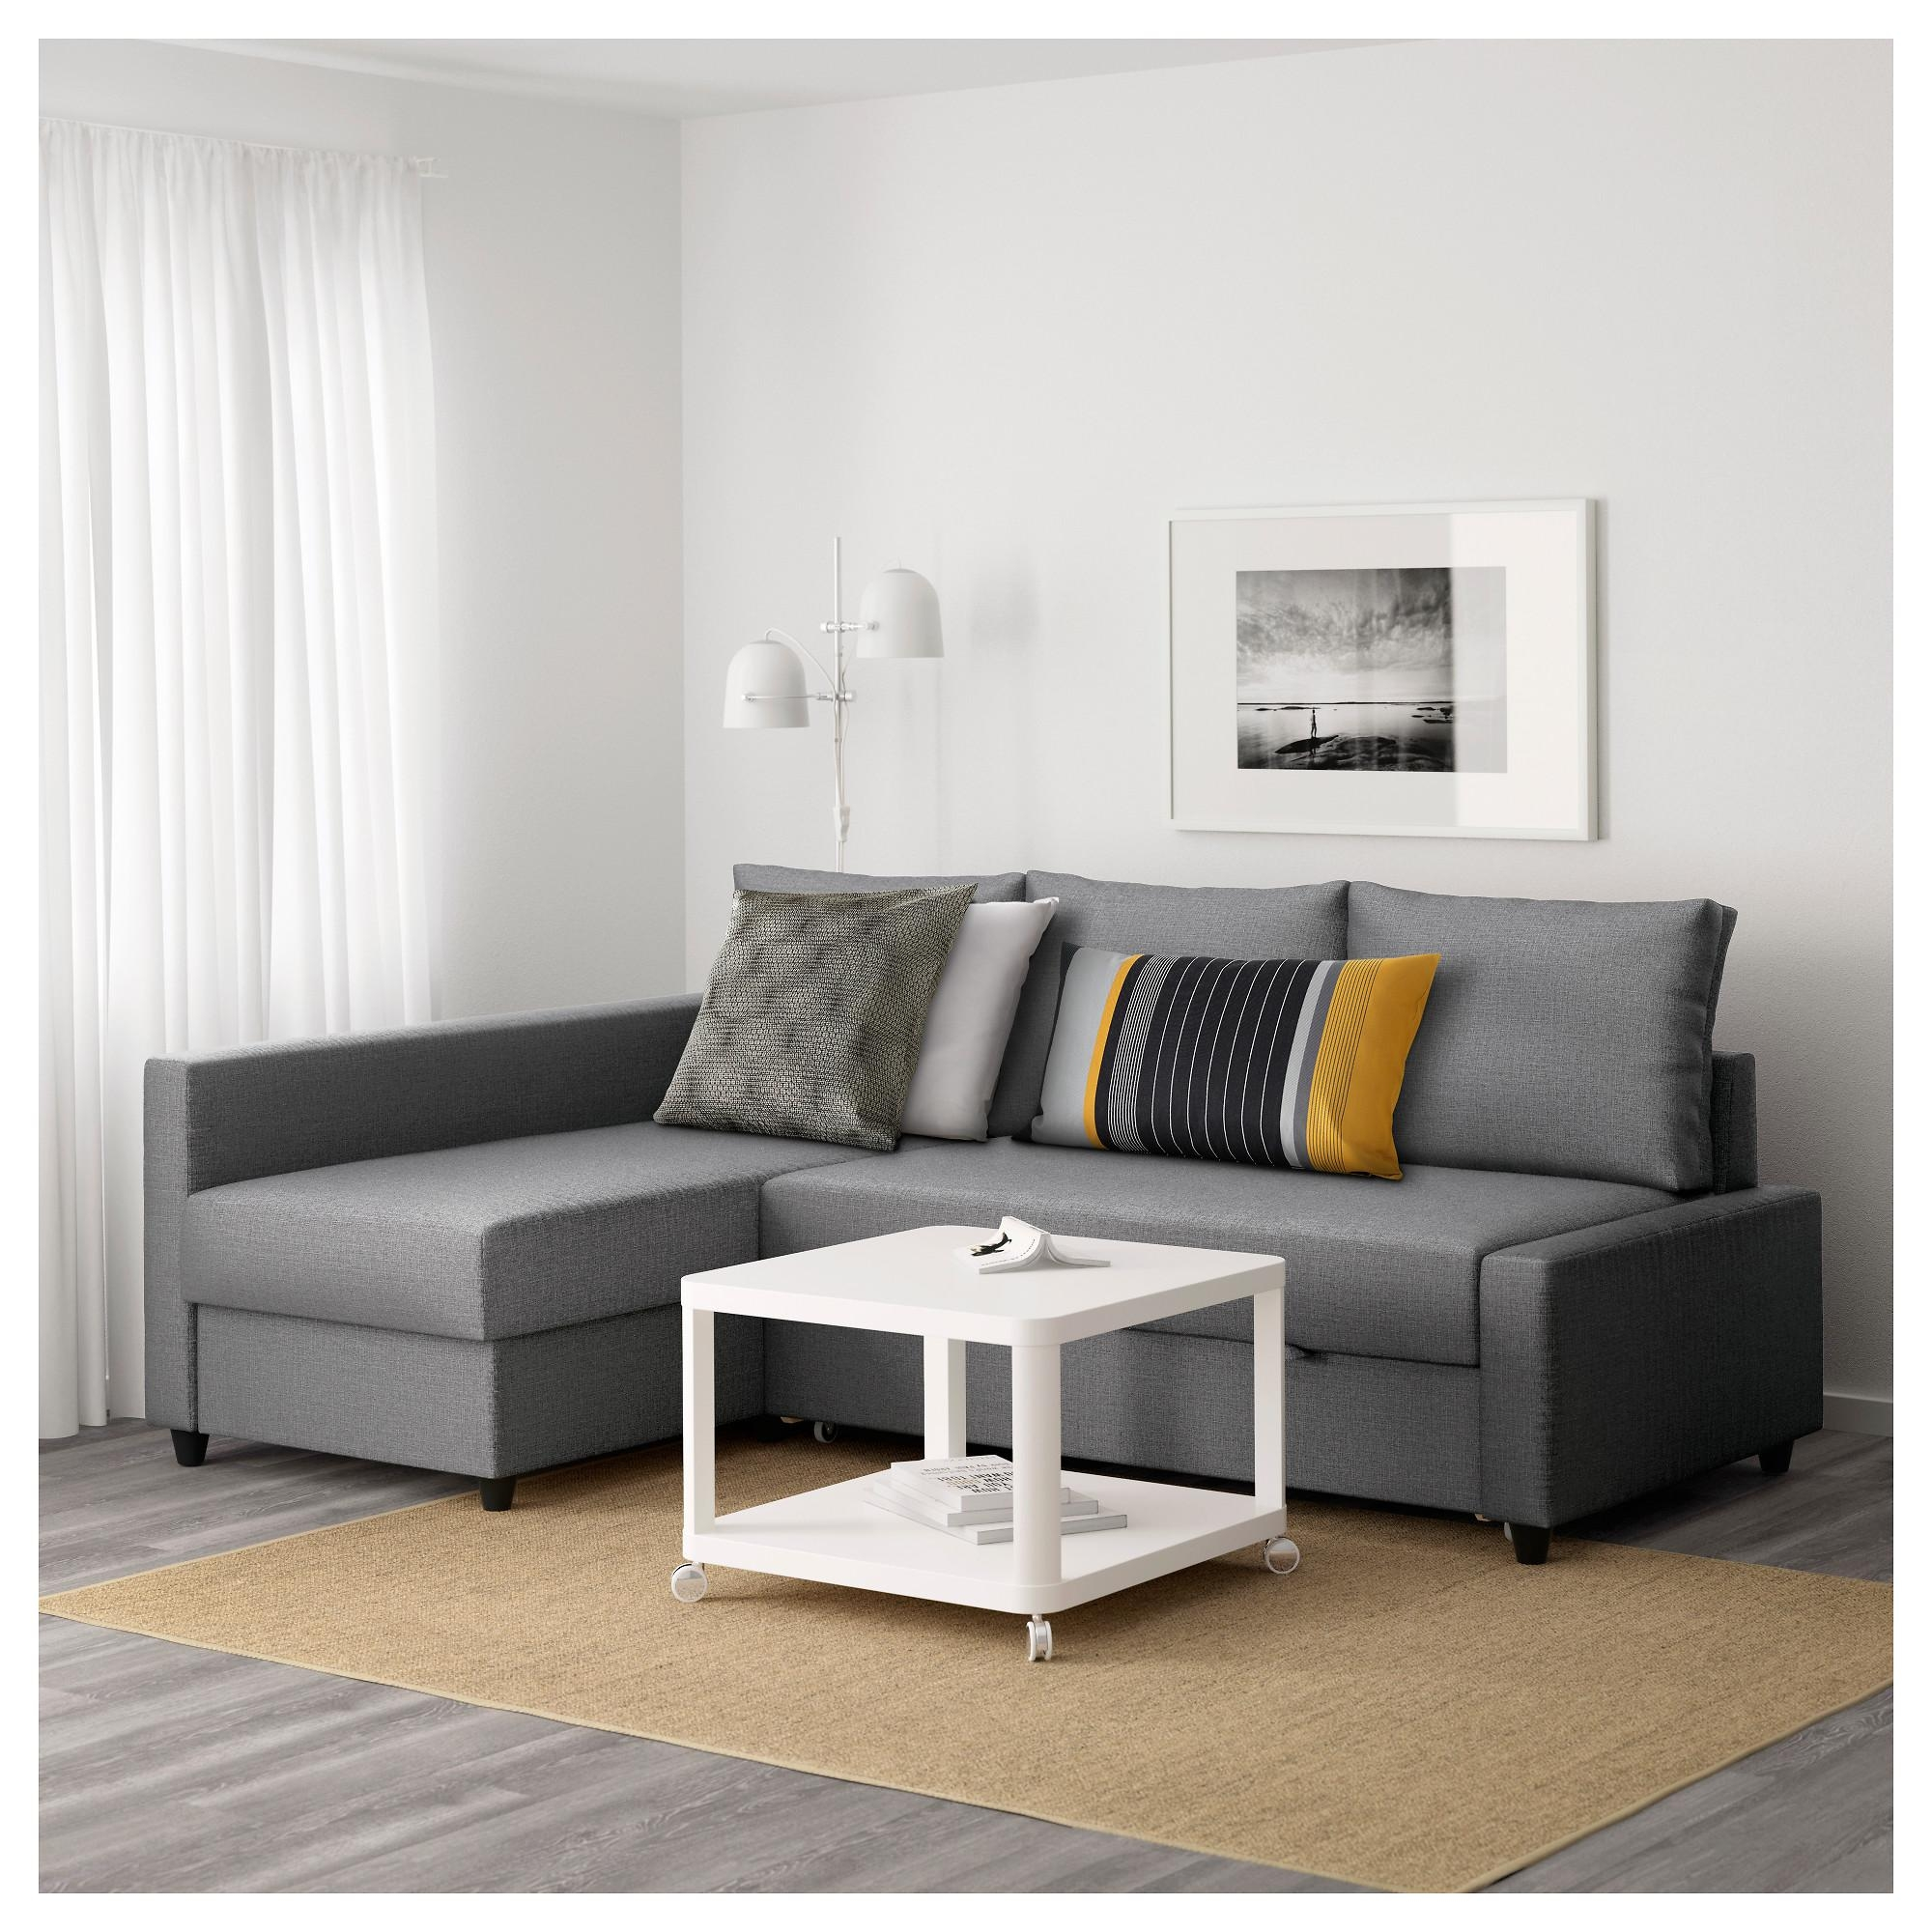 Friheten Corner Sofa Bed With Storage Skiftebo Dark Grey – Ikea Inside Storage Sofa Ikea (View 3 of 20)